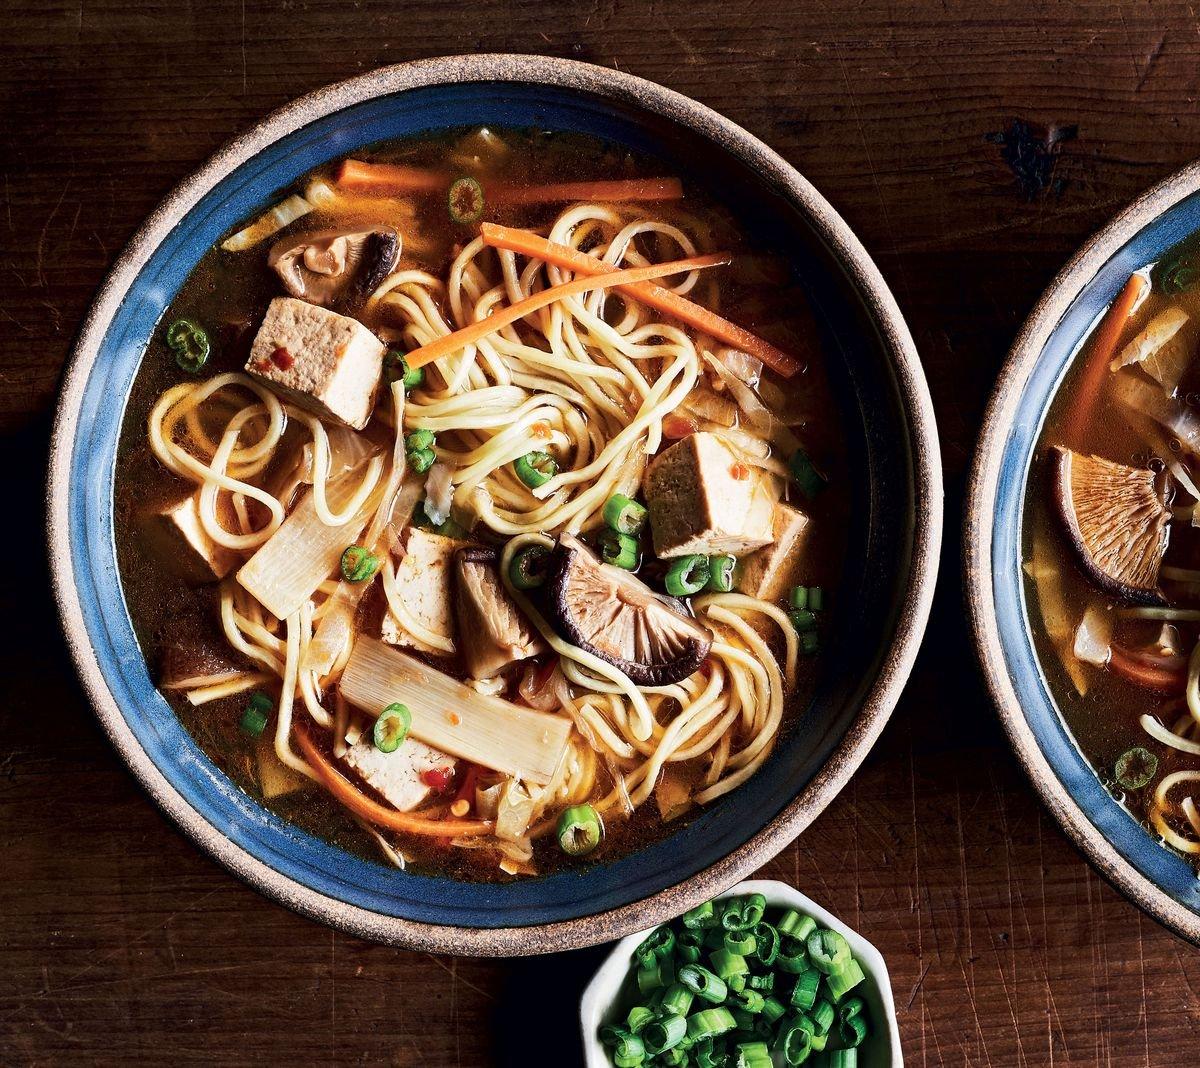 Slow-Cooker Shiitake-Noodle Hot & Sour Soup